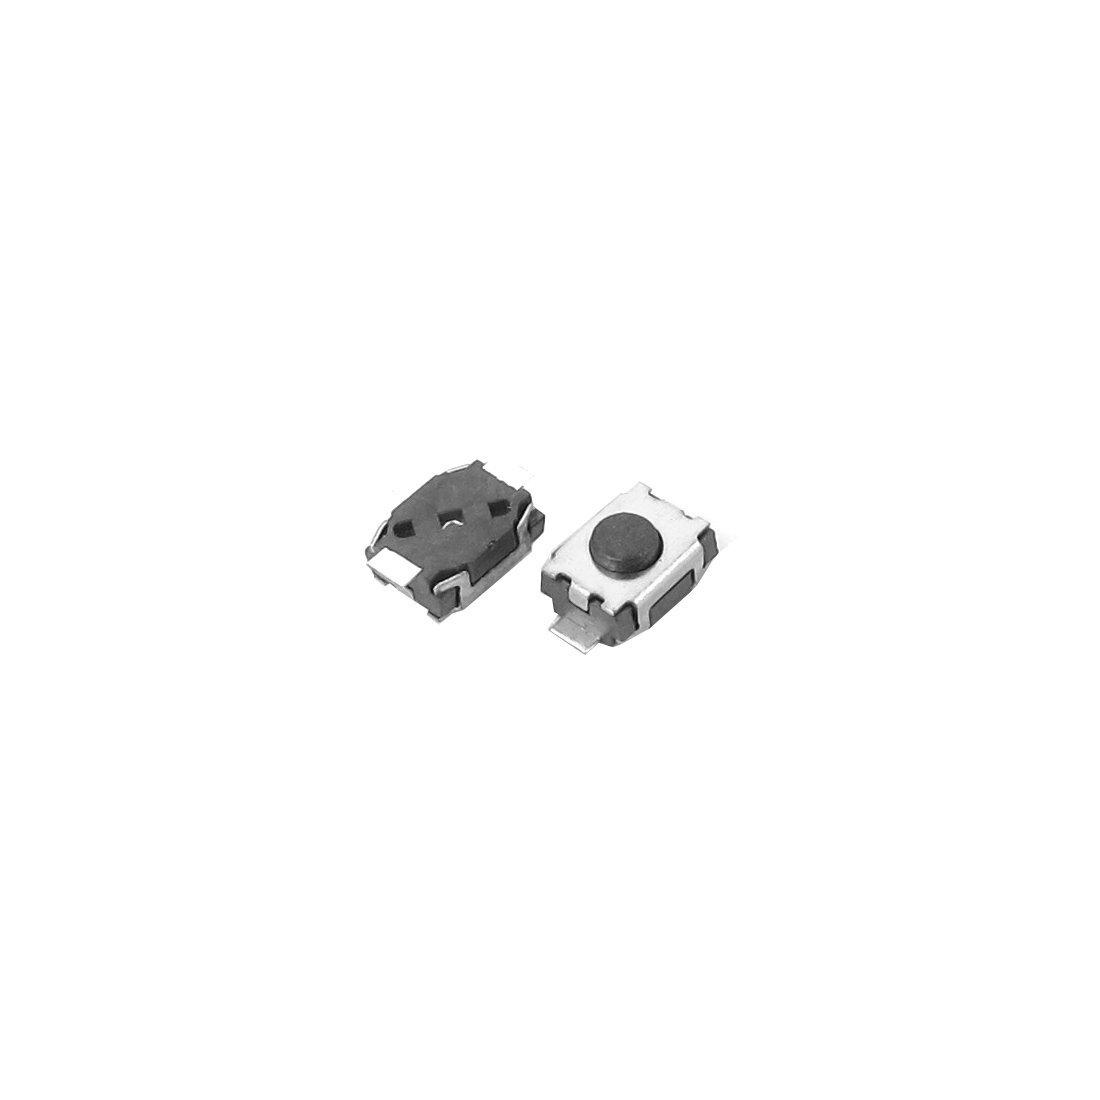 DealMux 4x3x2mm 2 pinos PCB SMD SMT Push Button Tact Tactile Ligue 100 Pcs